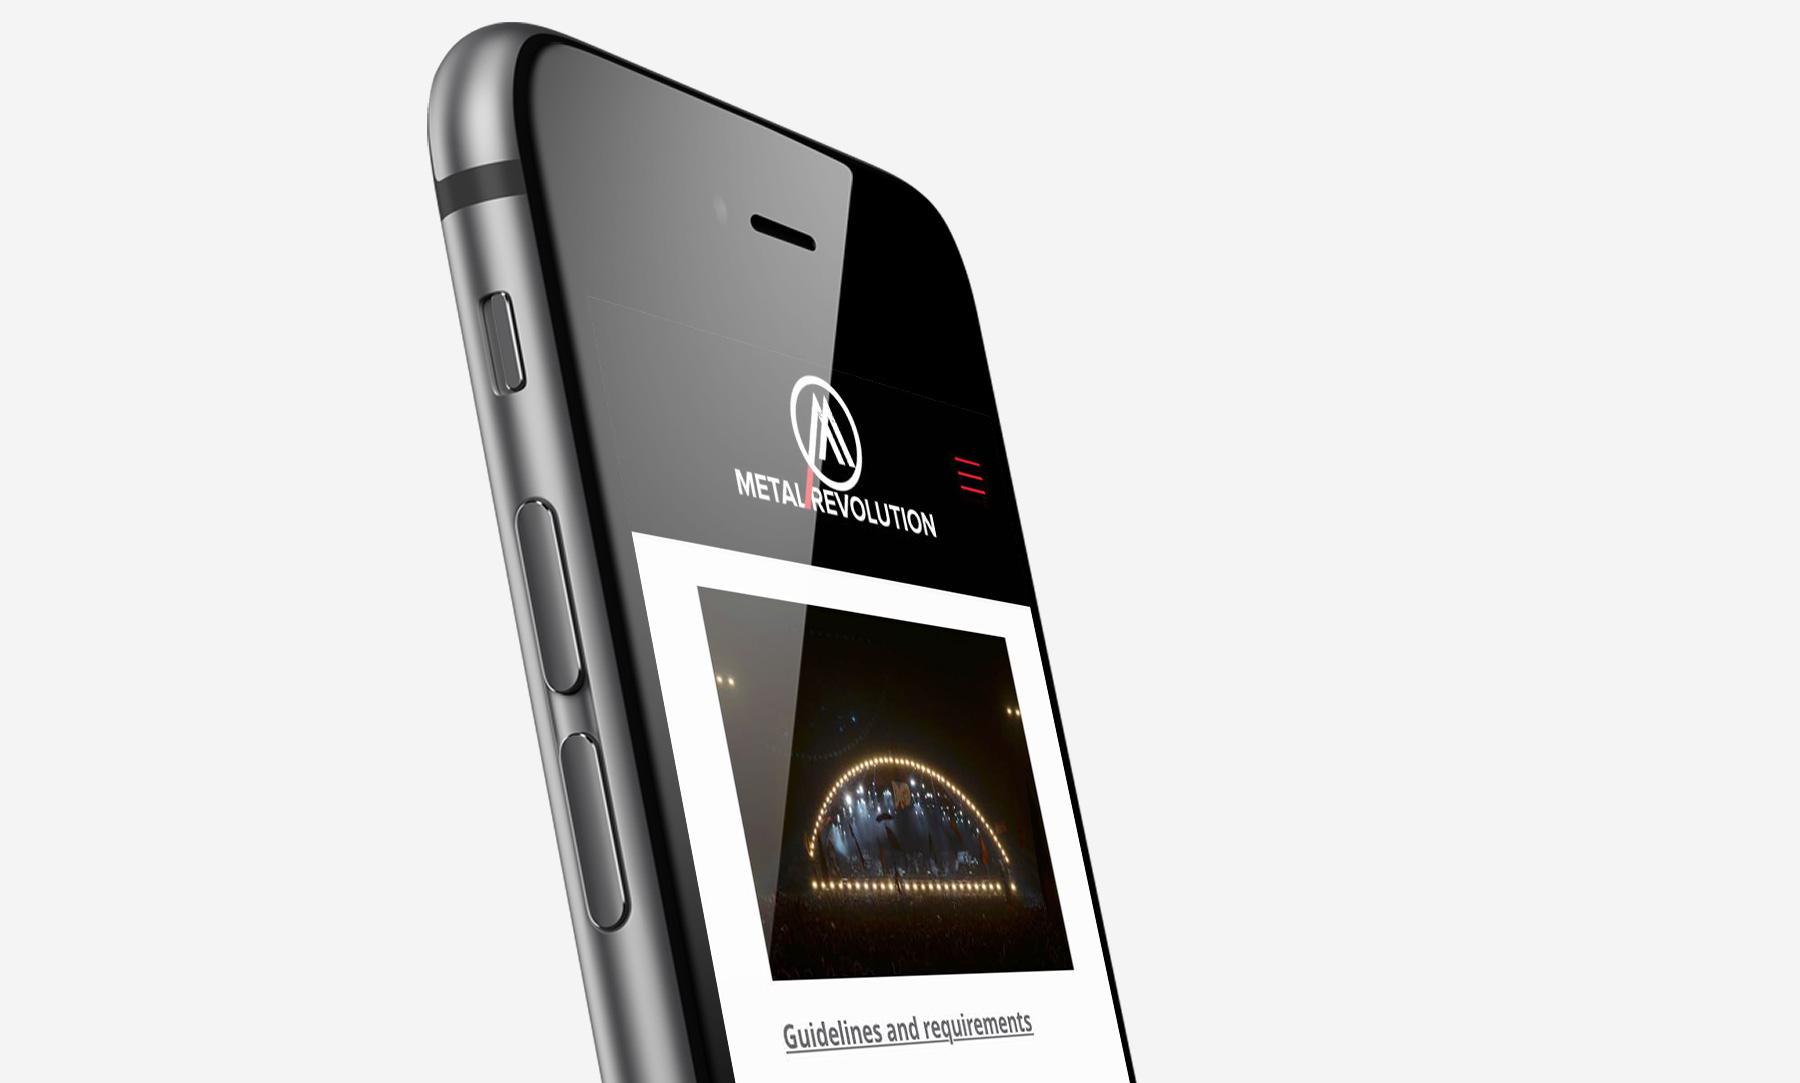 Metal Revolution: Mobile